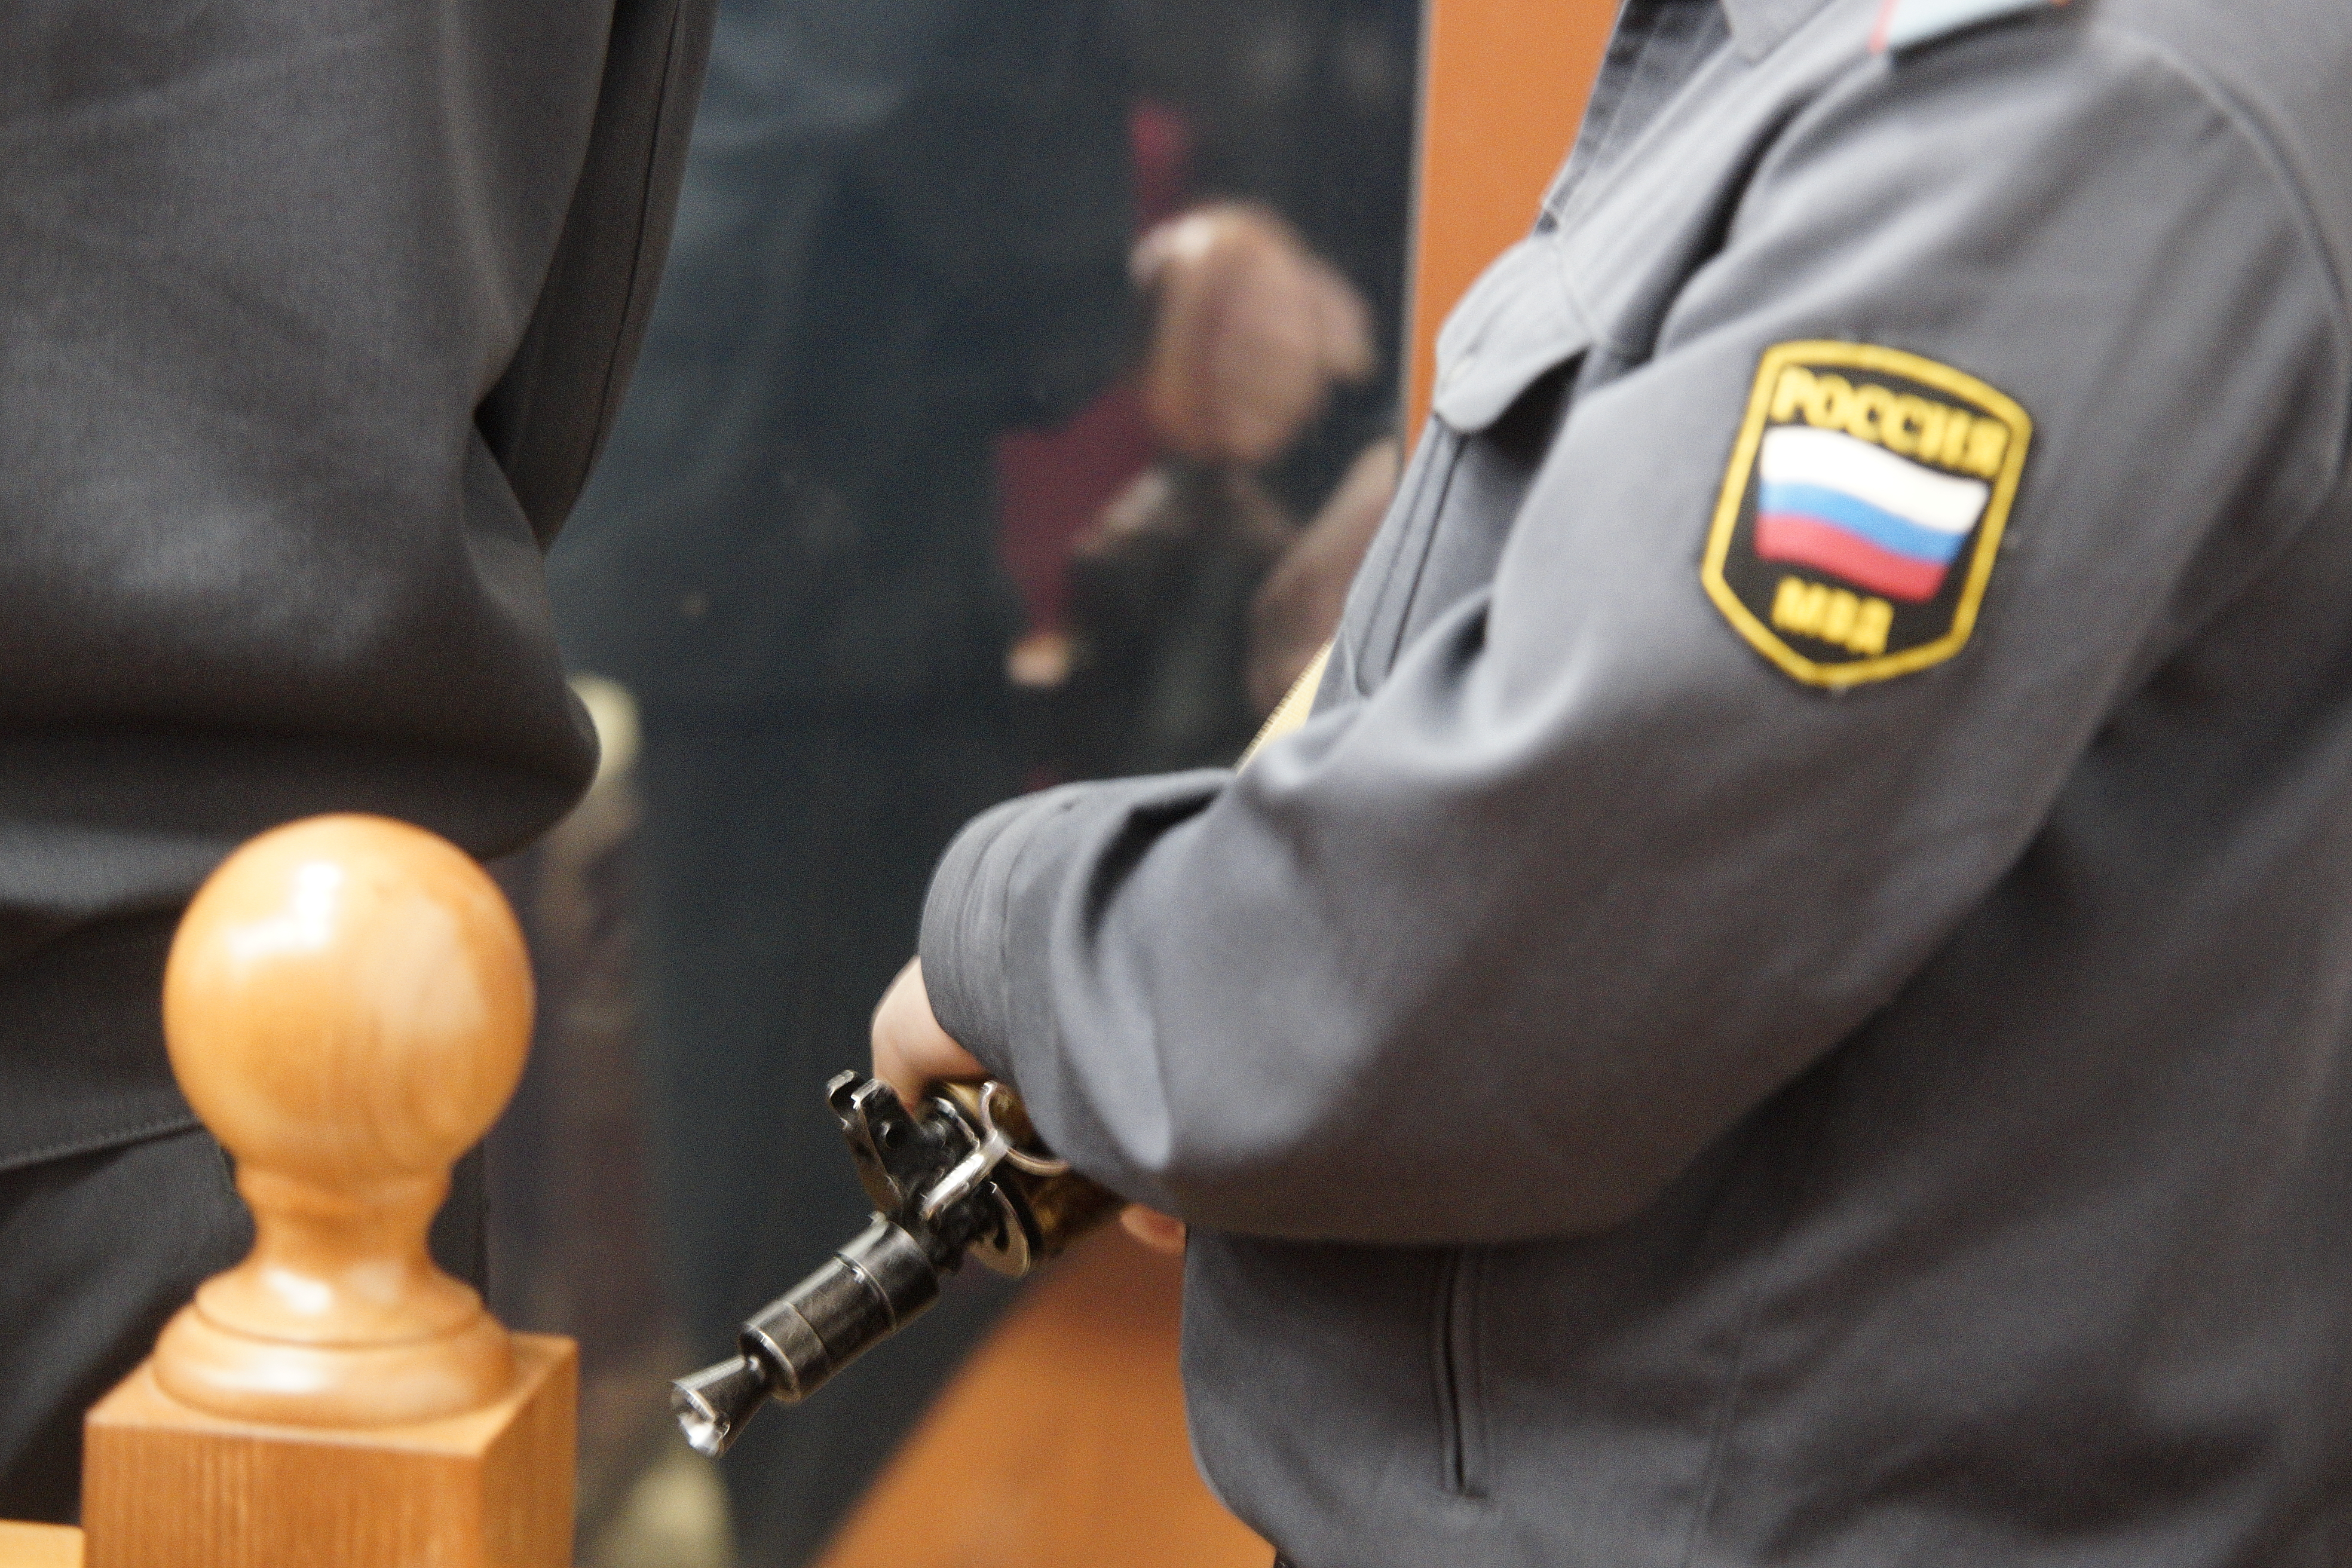 ВЕкатеринбурге изфуры украли 300 кегов пива, пока шофёр спал